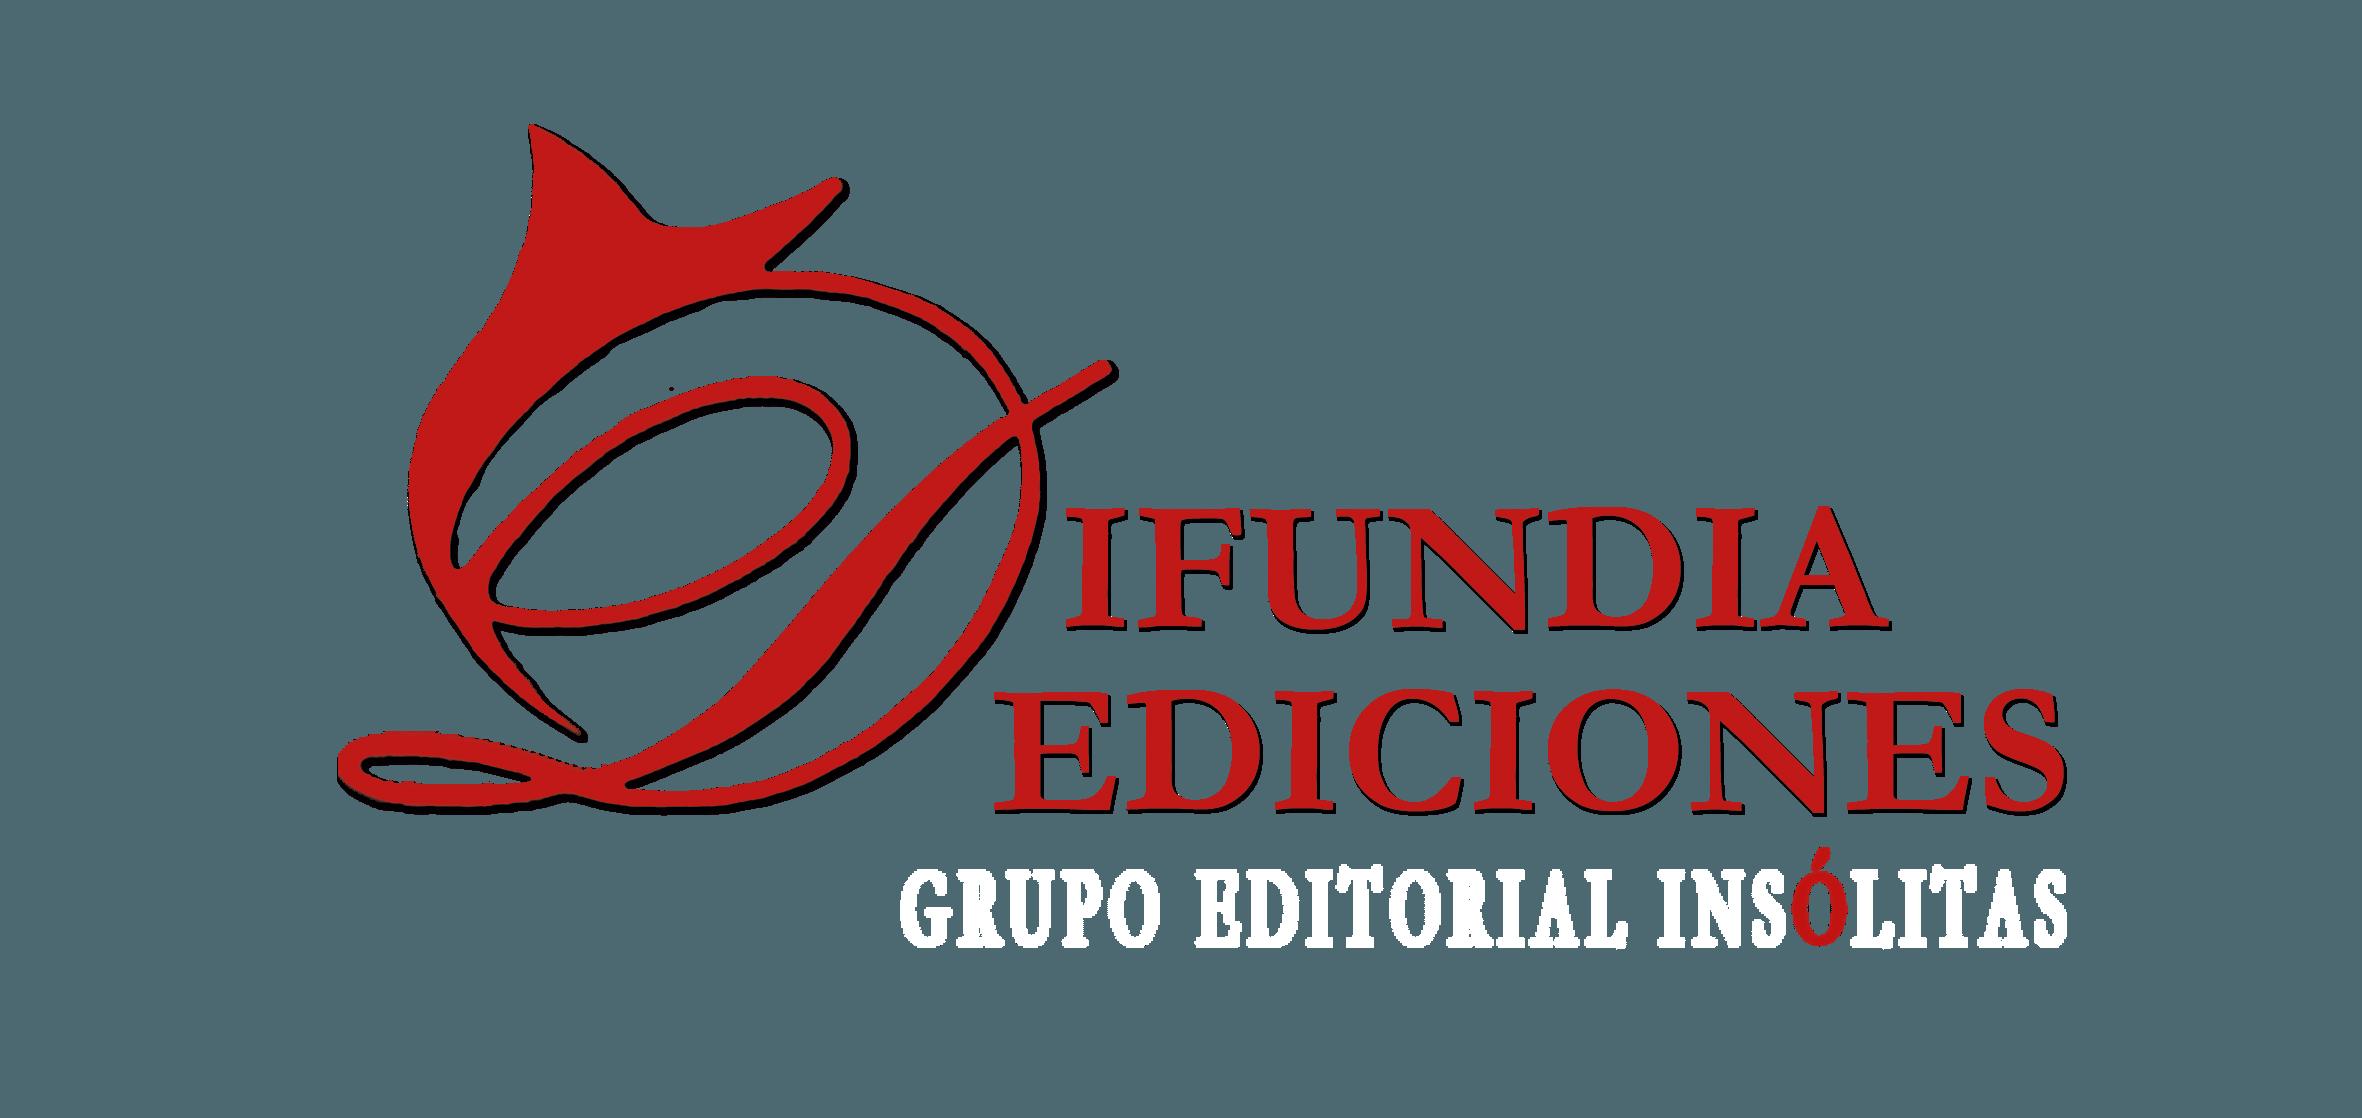 Difundia Ediciones